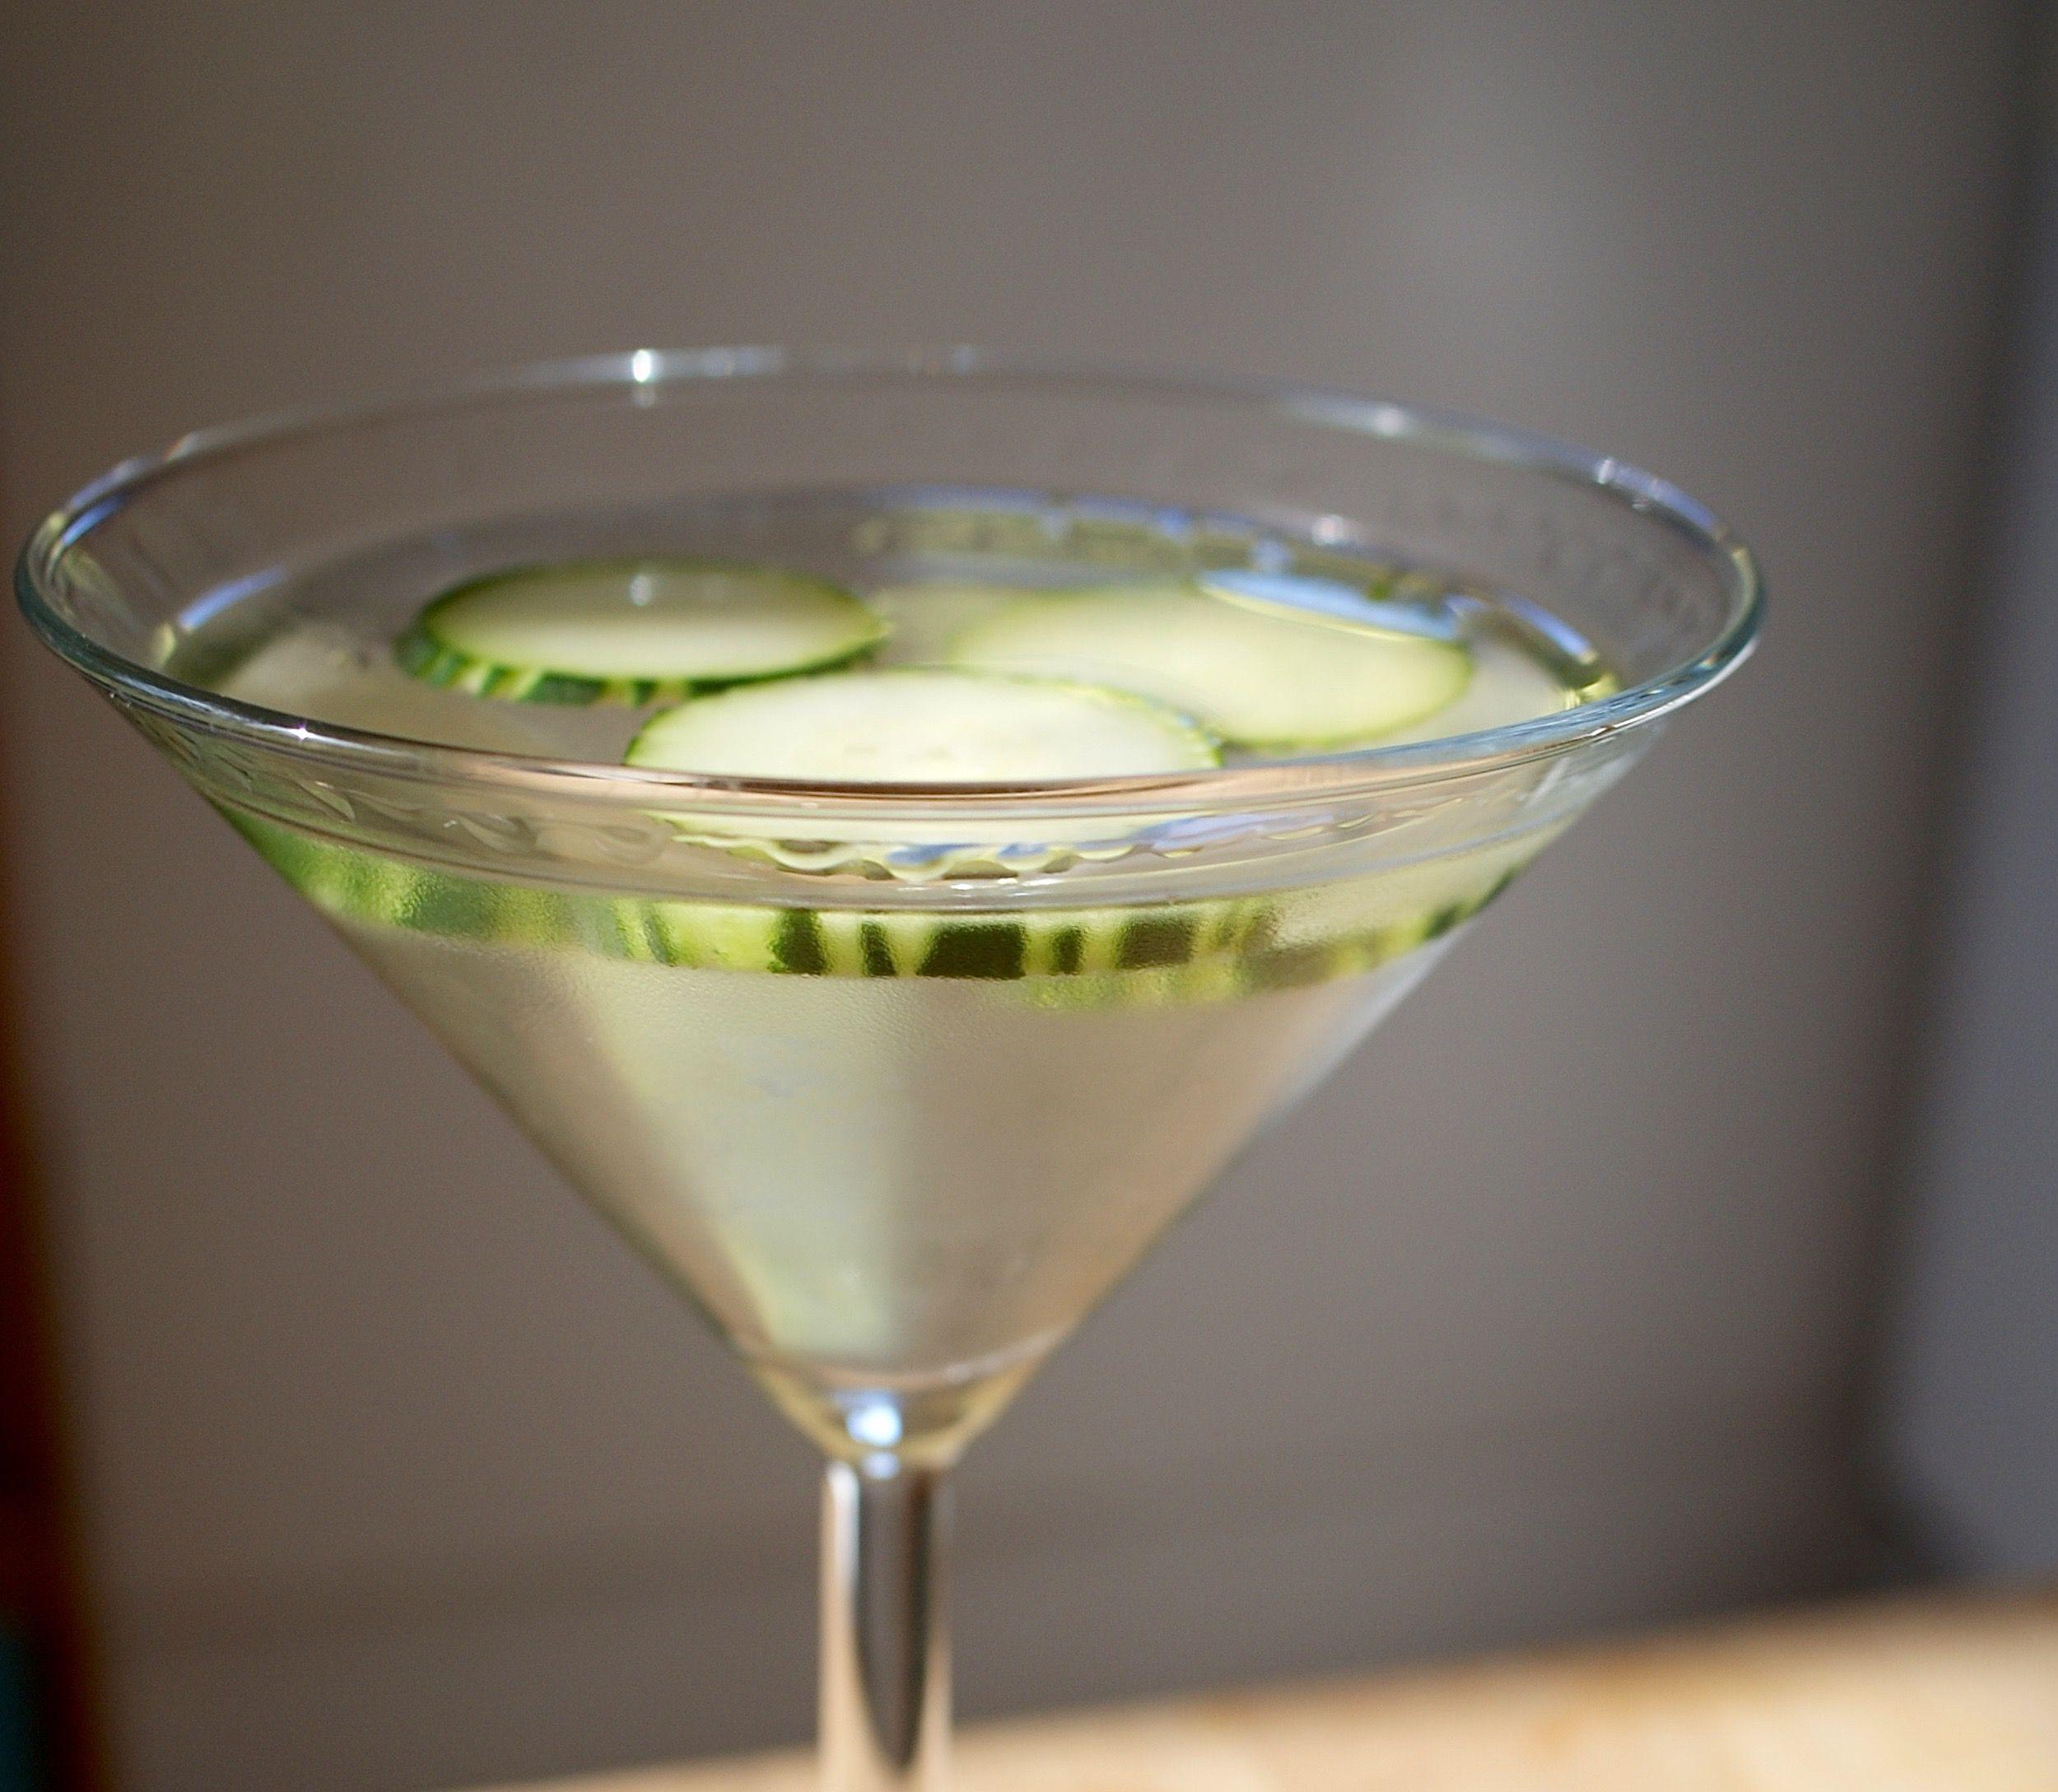 Cucumber-Infused Vodka Recipe